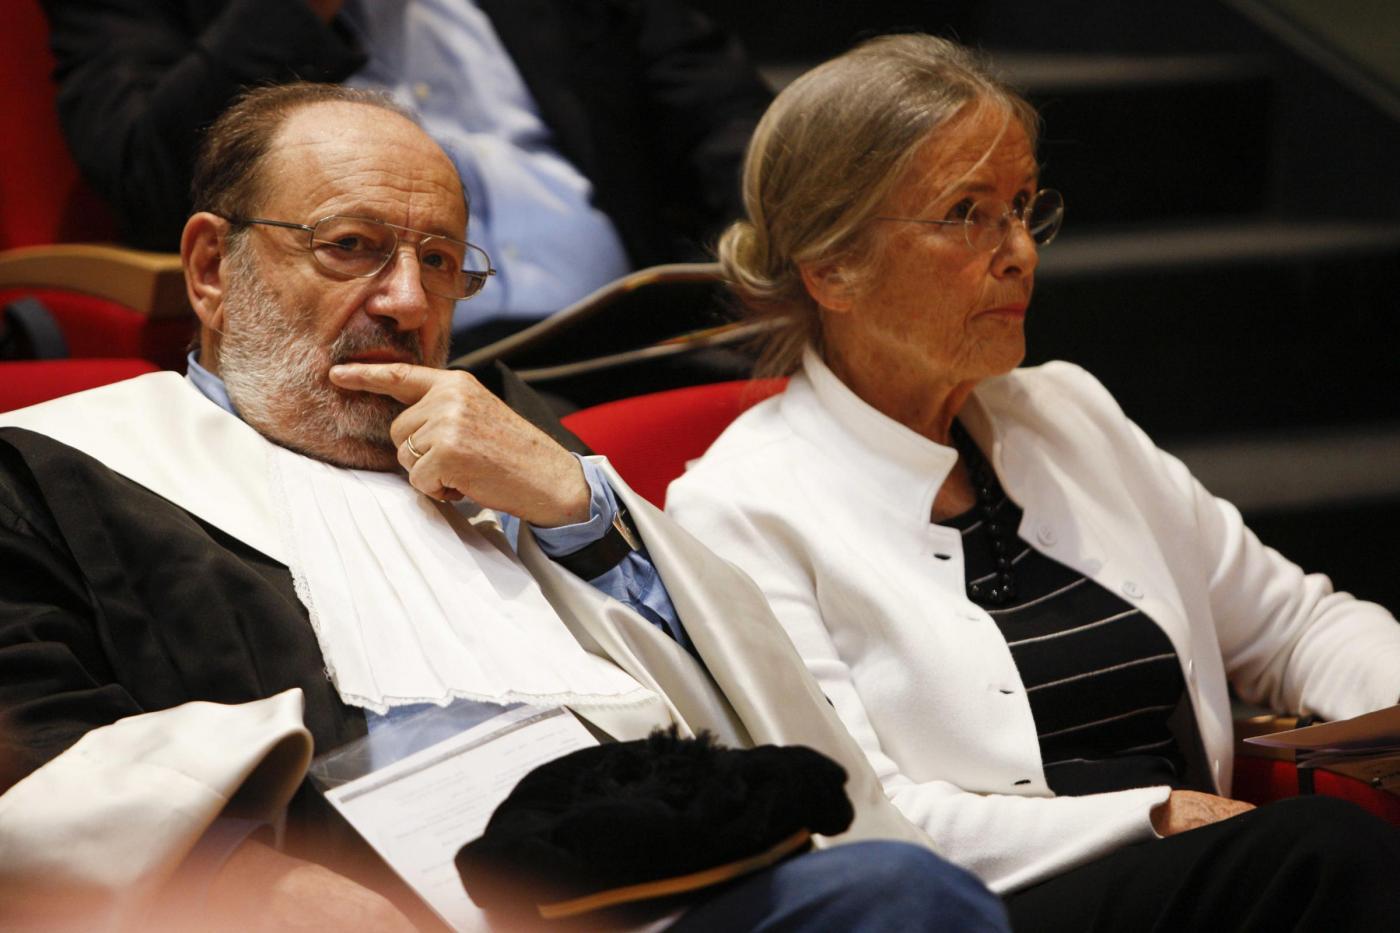 Umberto Eco e la moglie